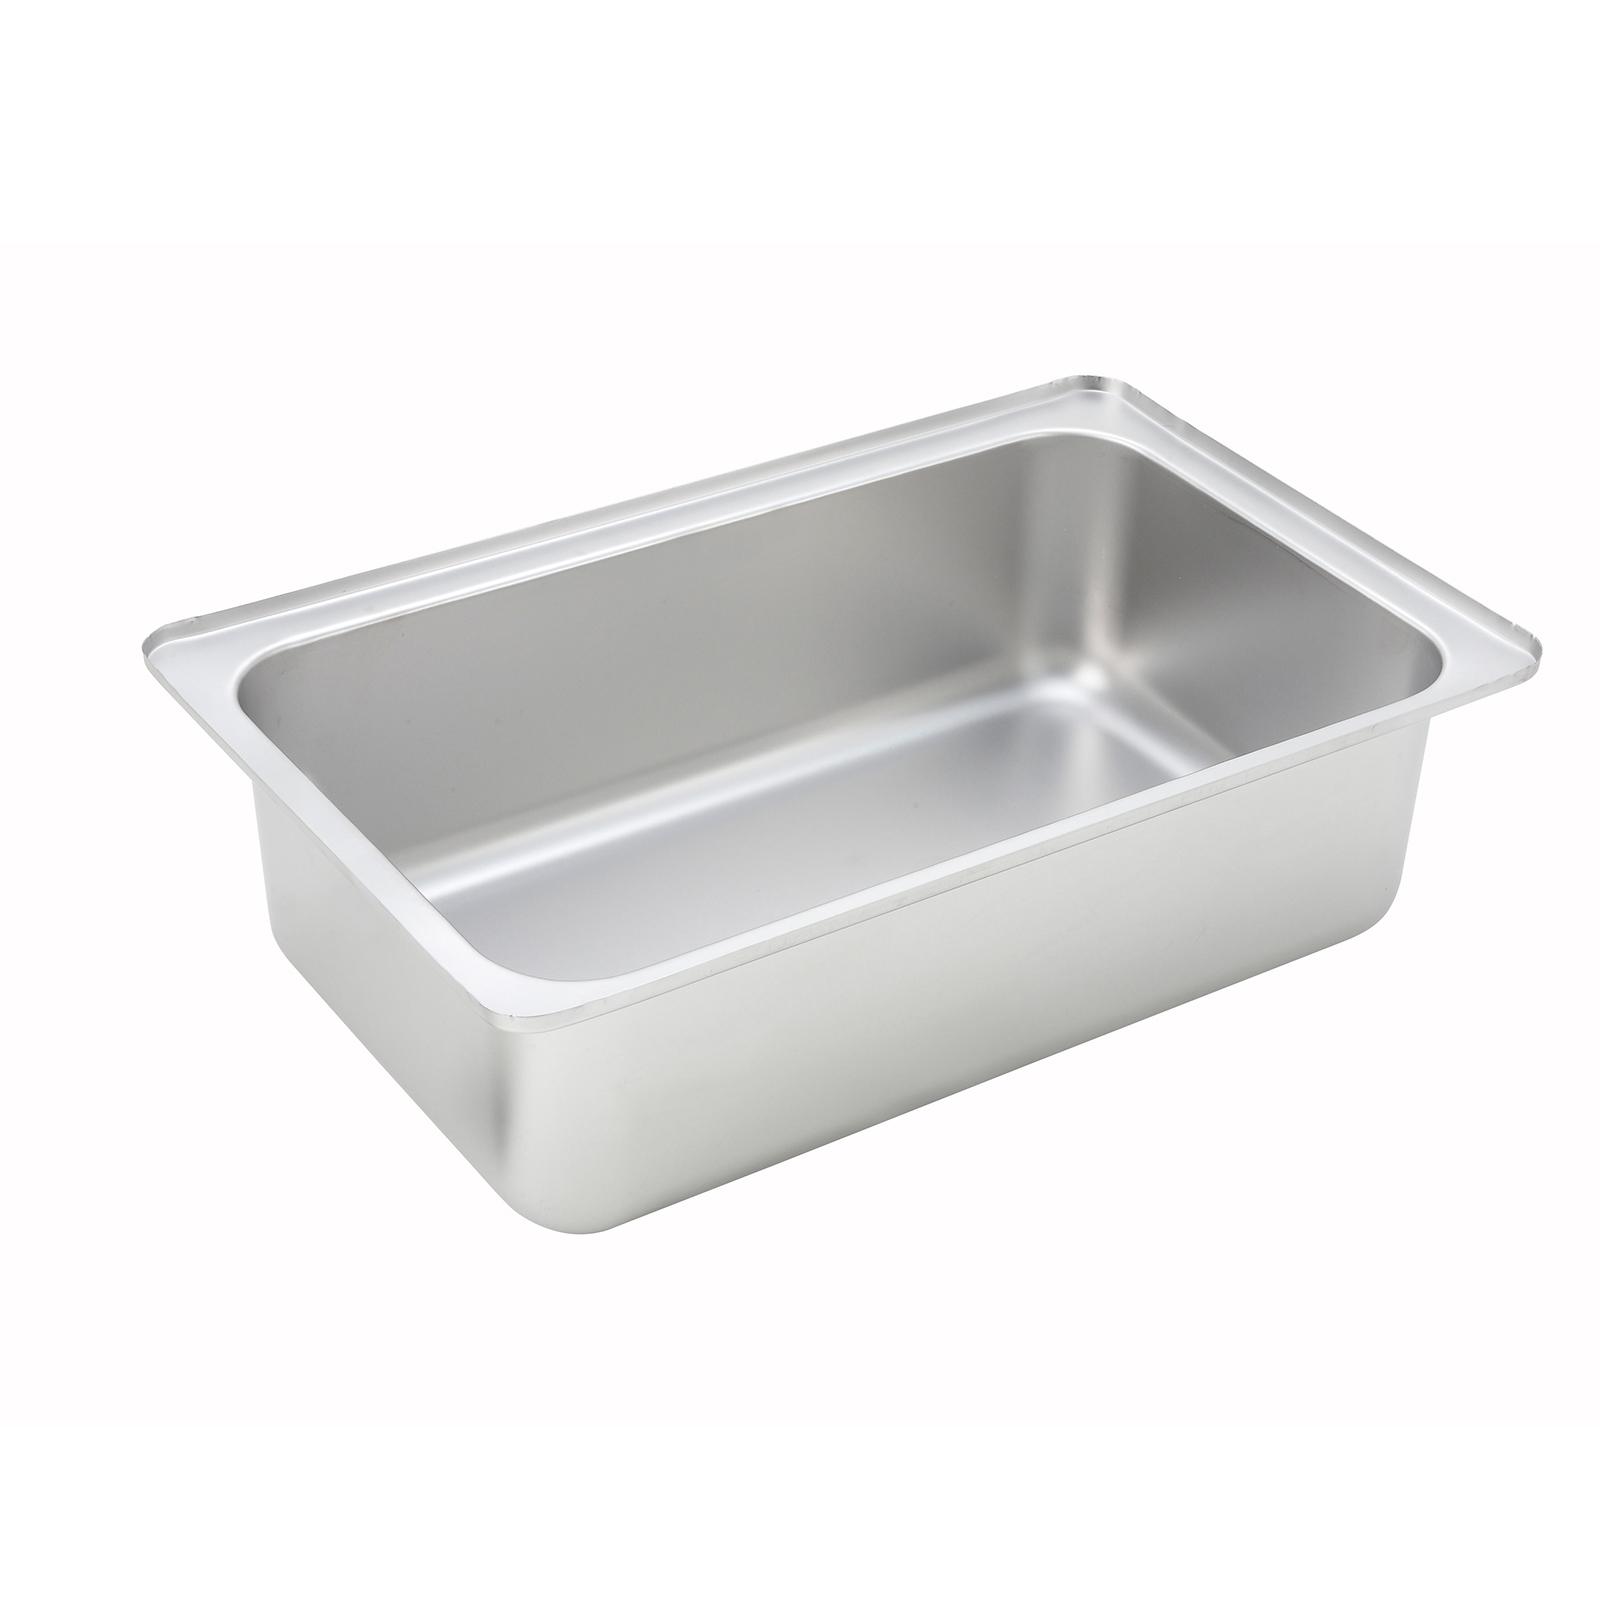 Winco C-WPF6 spillage pan